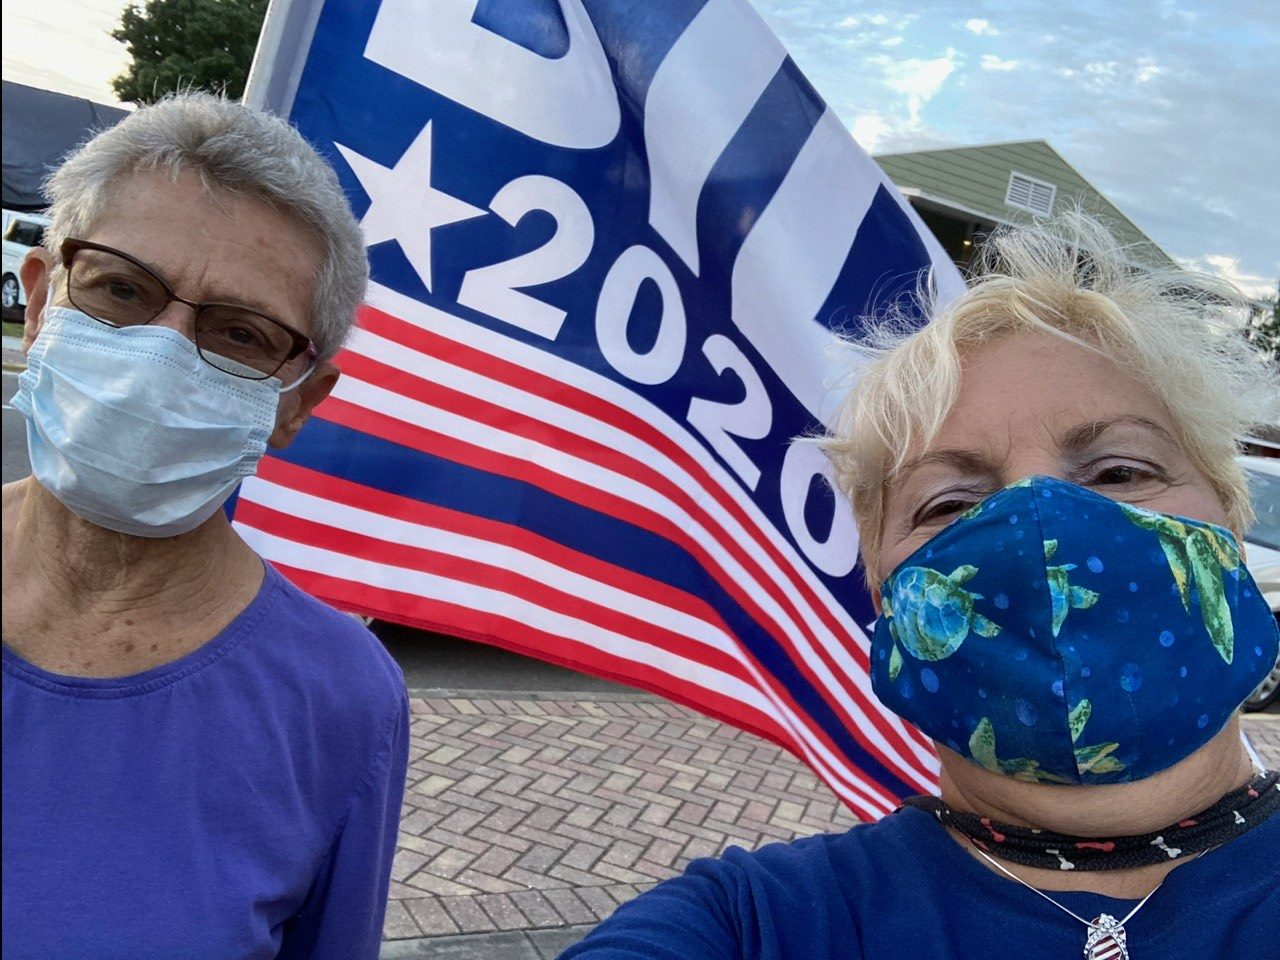 Anna and Gudrun - poll watchers